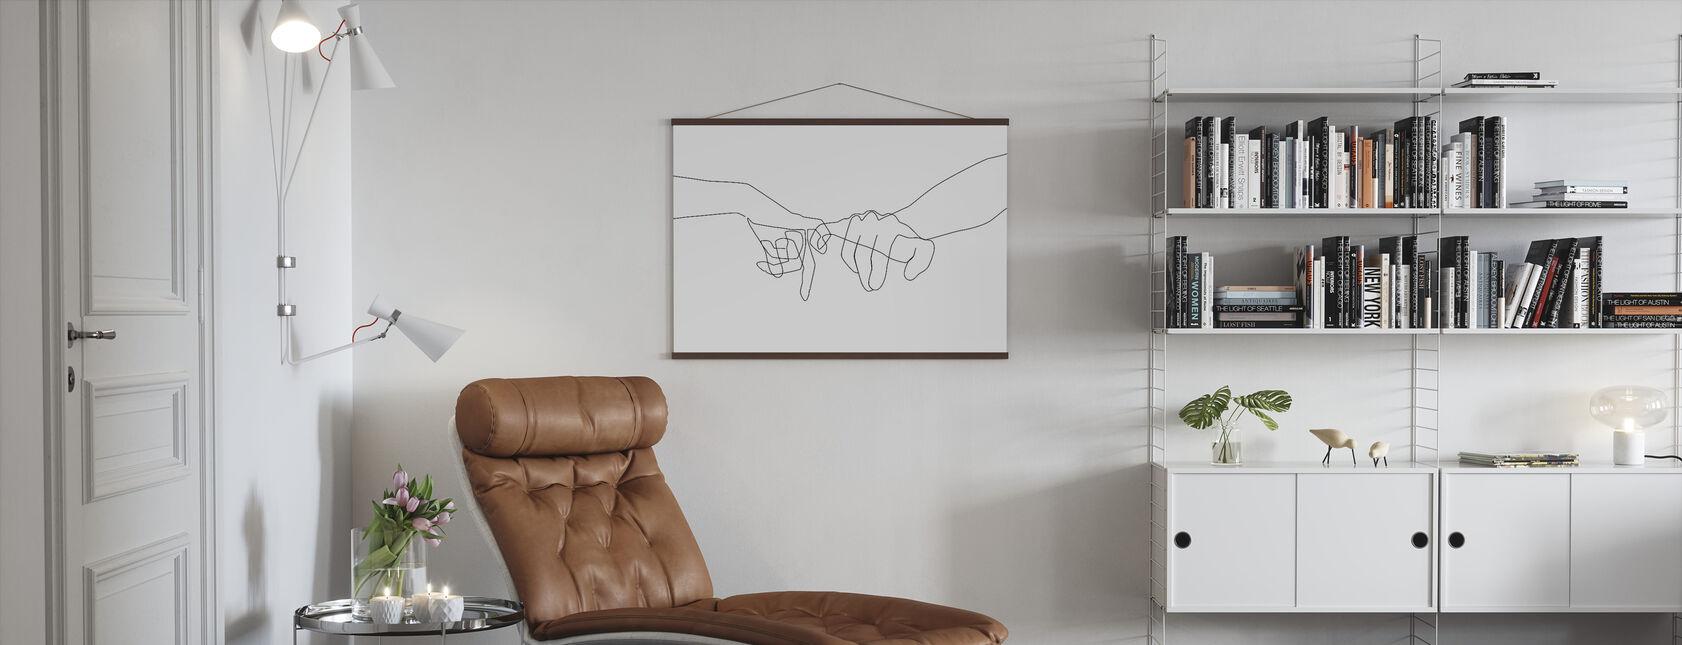 Pinky Zweer - Poster - Woonkamer